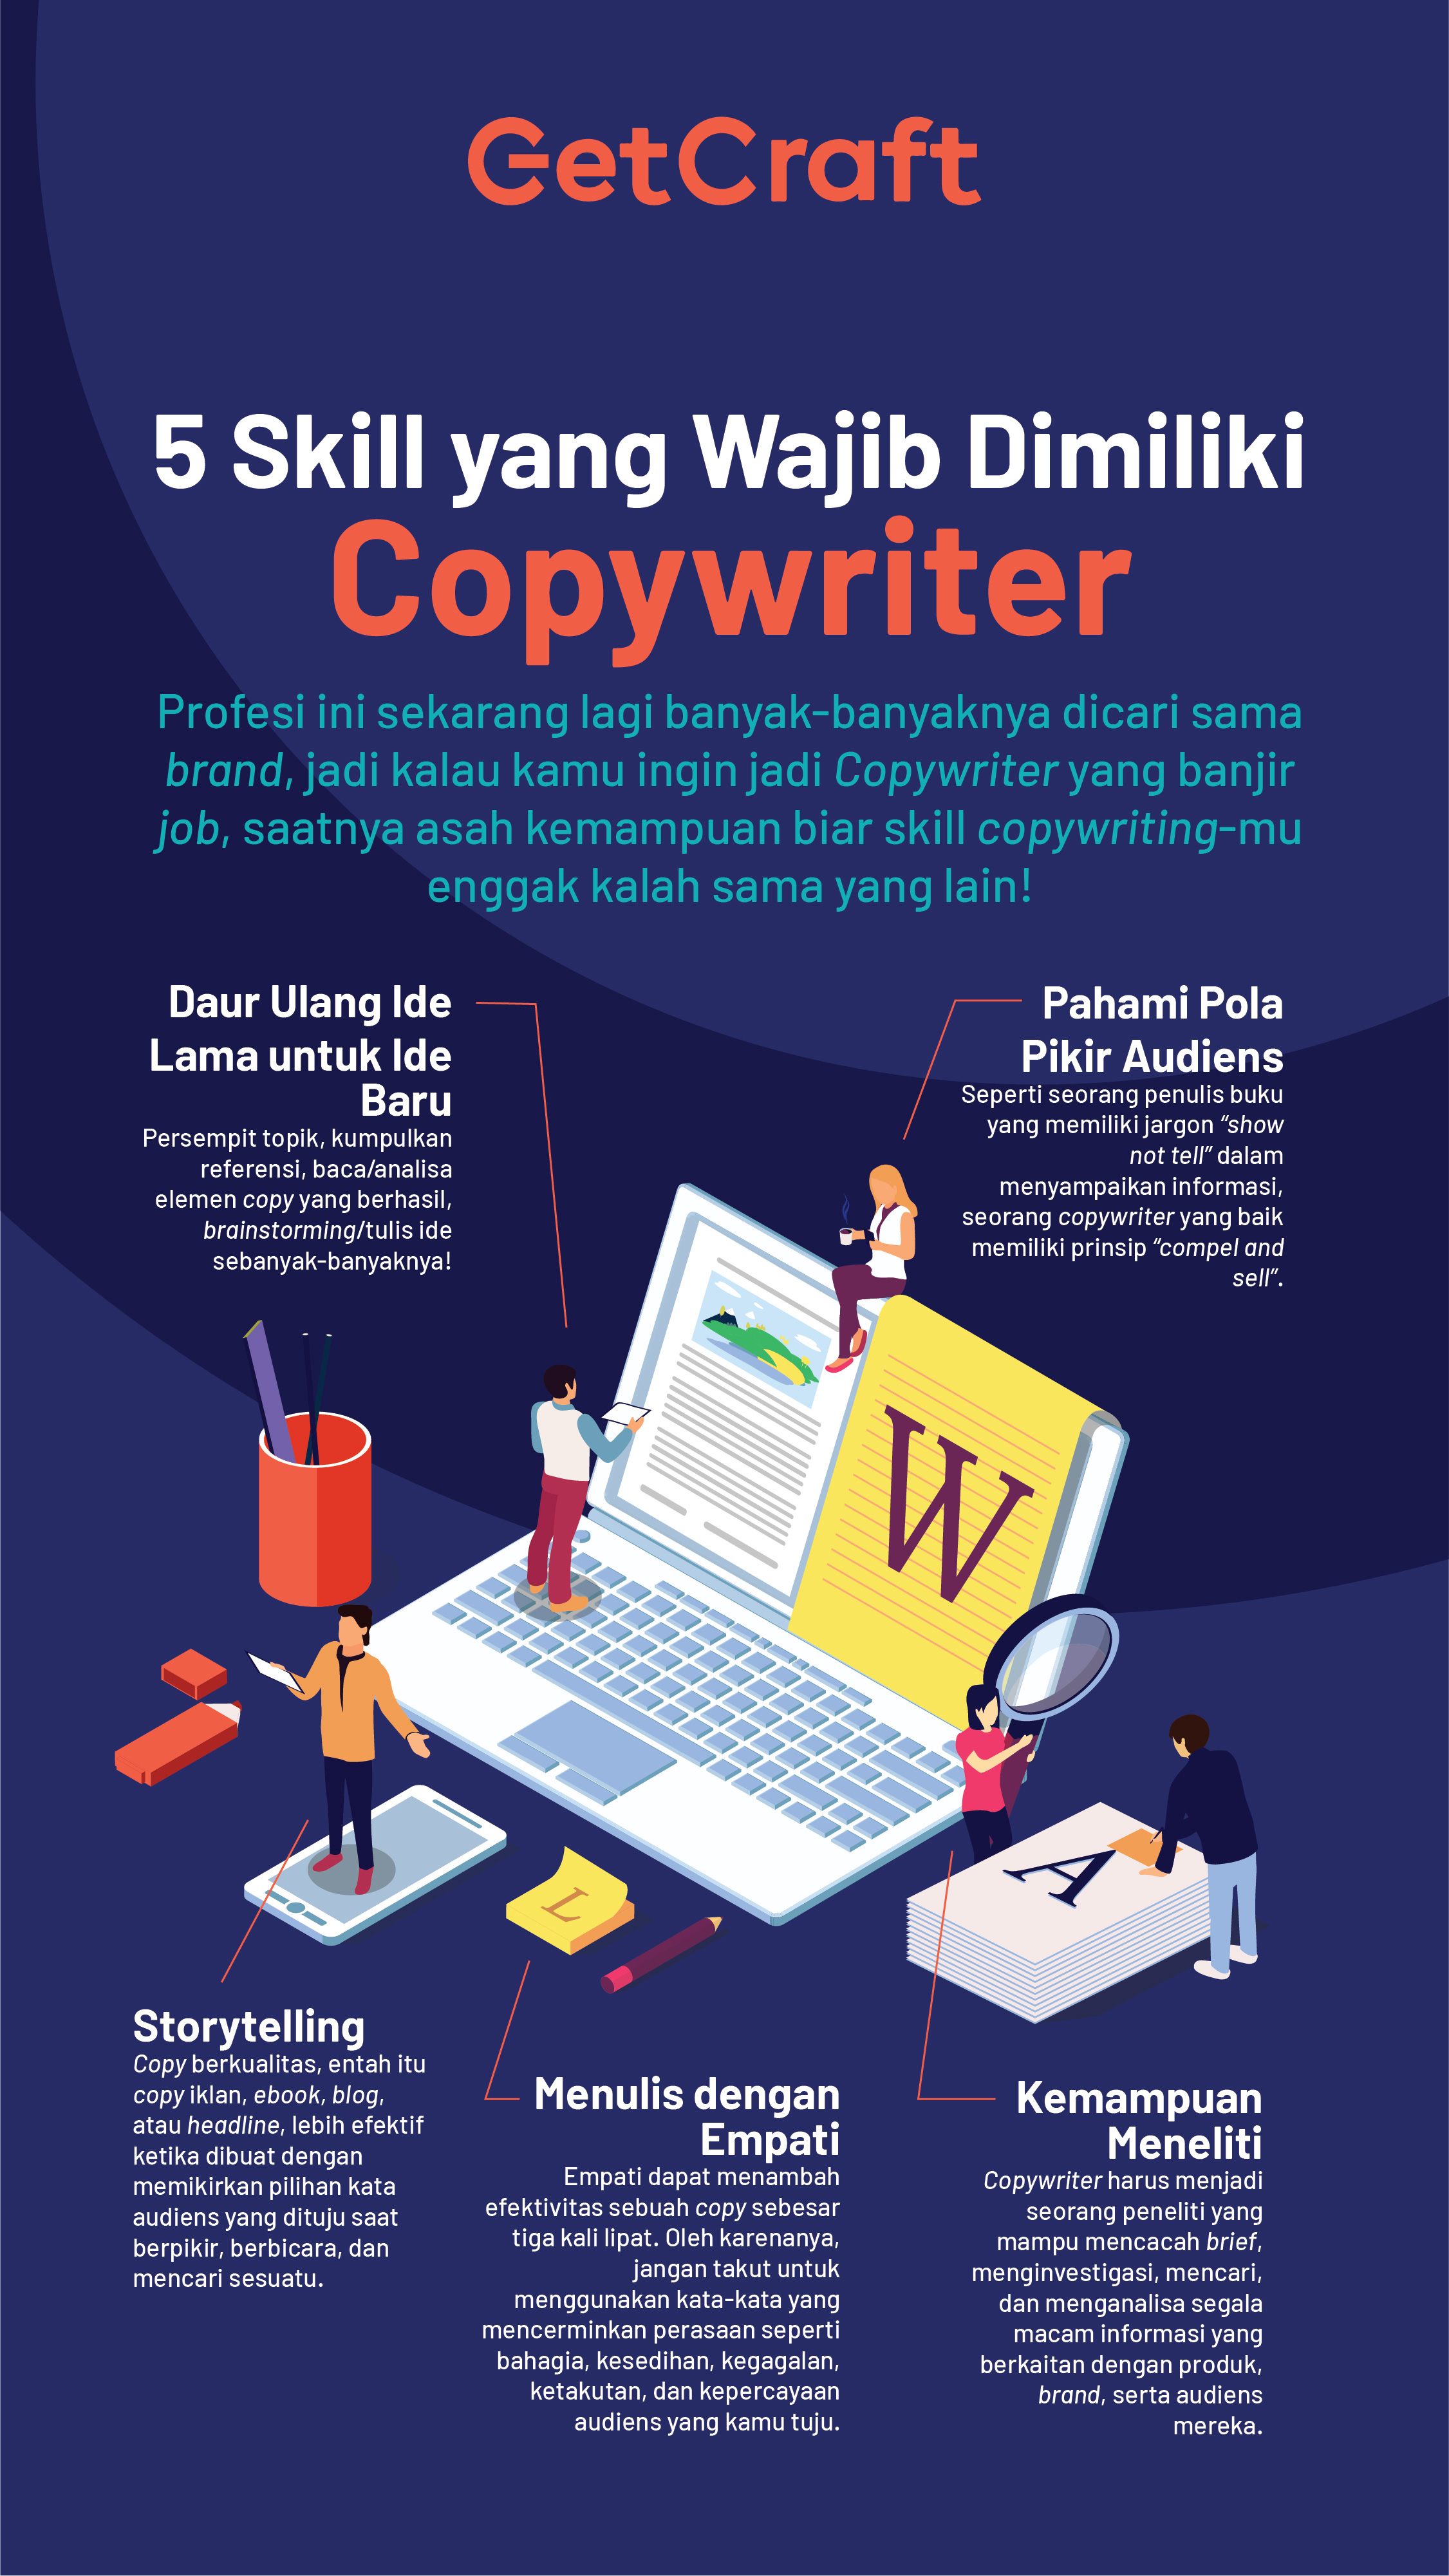 5 Skill yang Wajib Dimiliki Copywriter